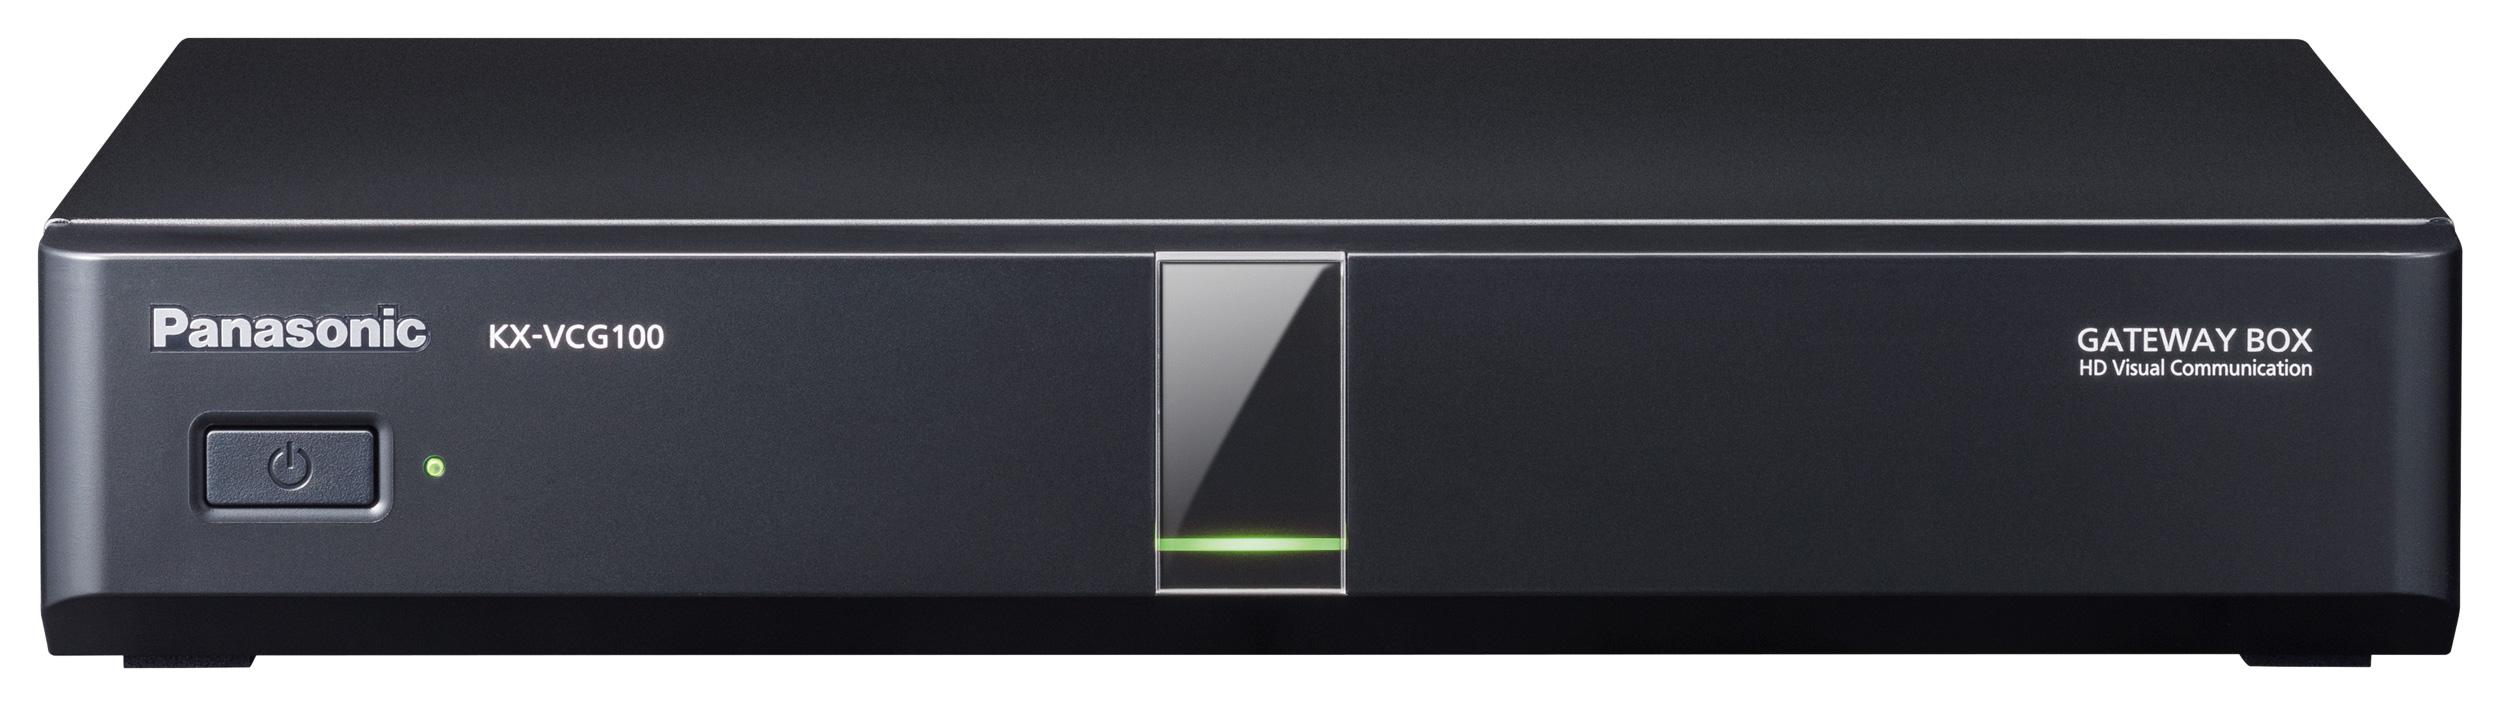 KX-VCG100J 高解像度用JPG